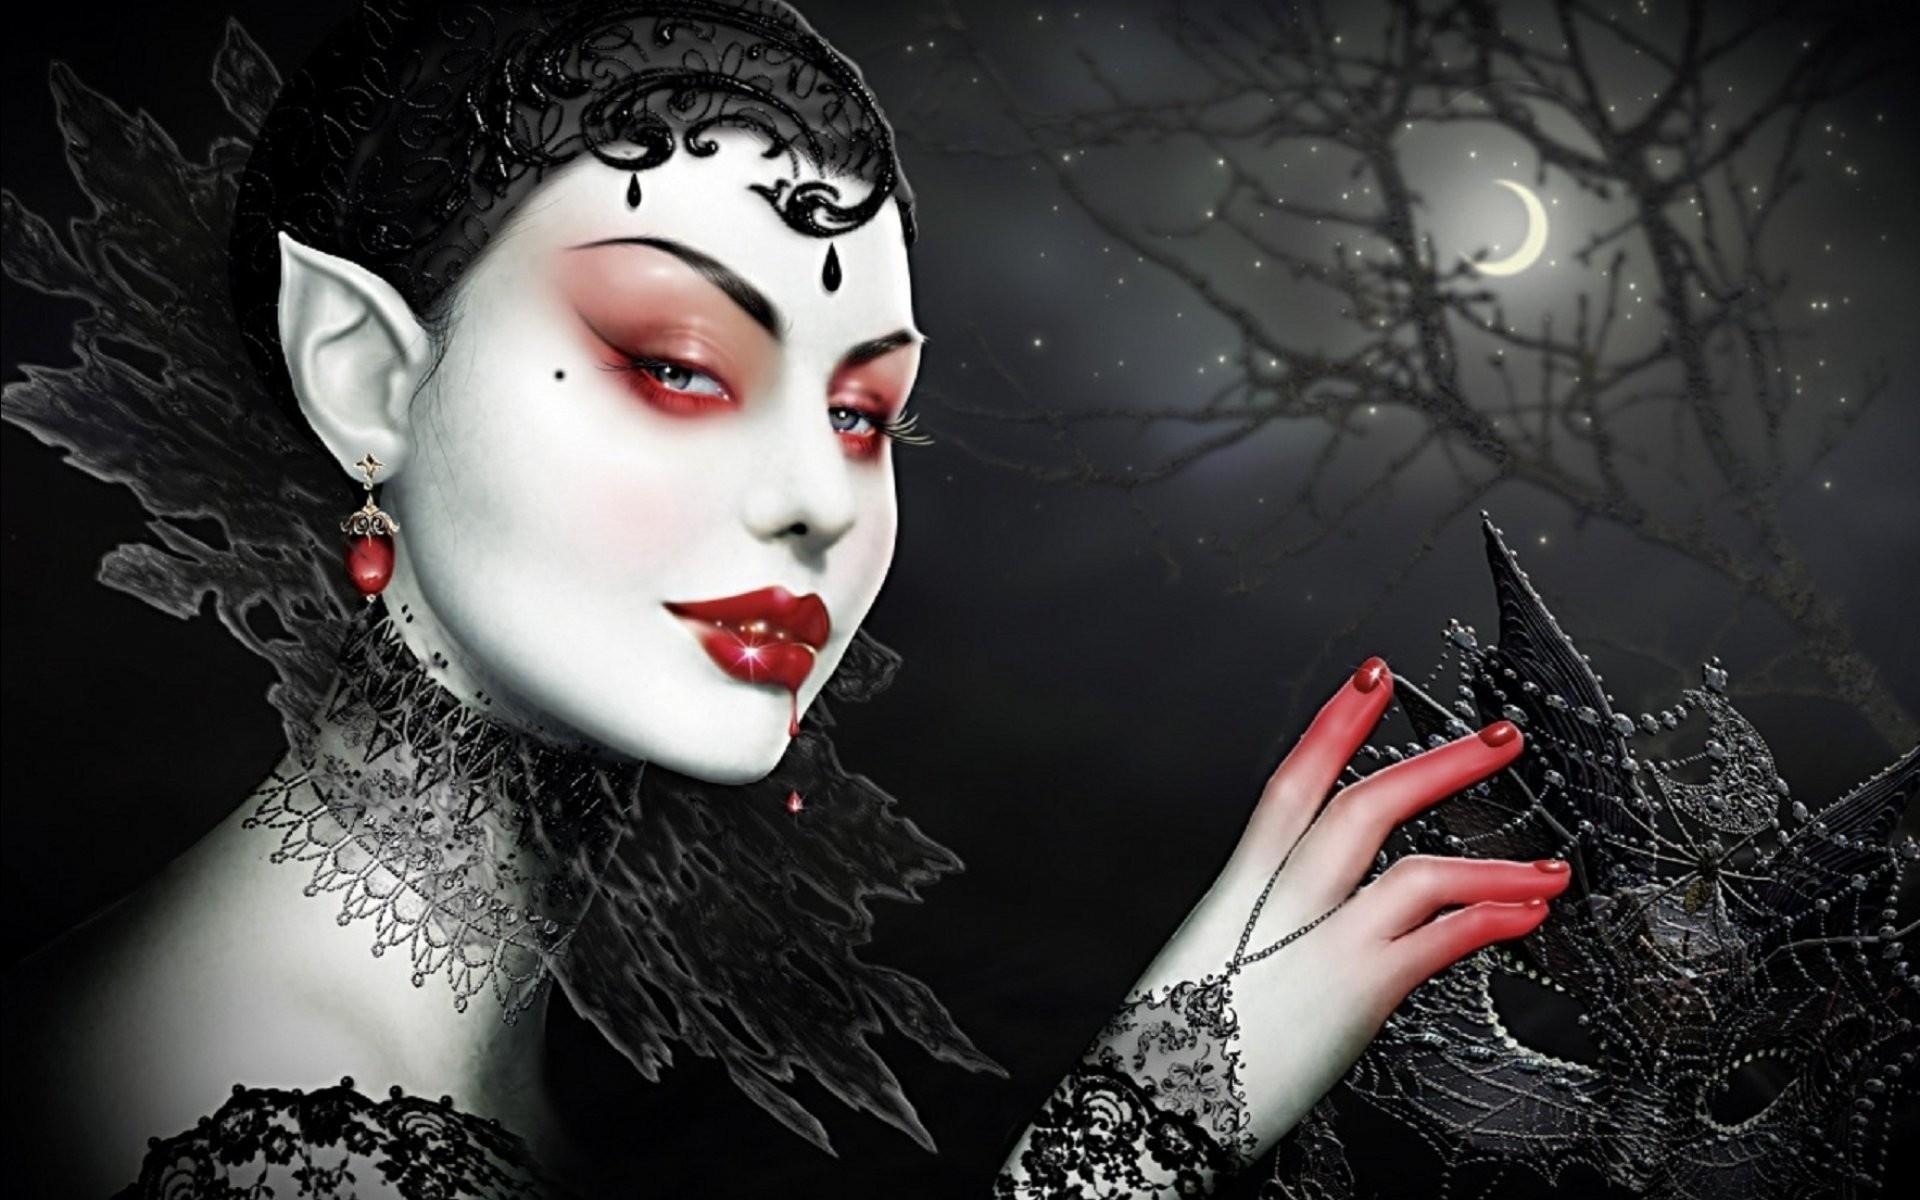 Fantasy Artwork Art Dark Vampire Gothic Girl Girls Horror Evil Blood  Wallpaper At Dark Wallpapers